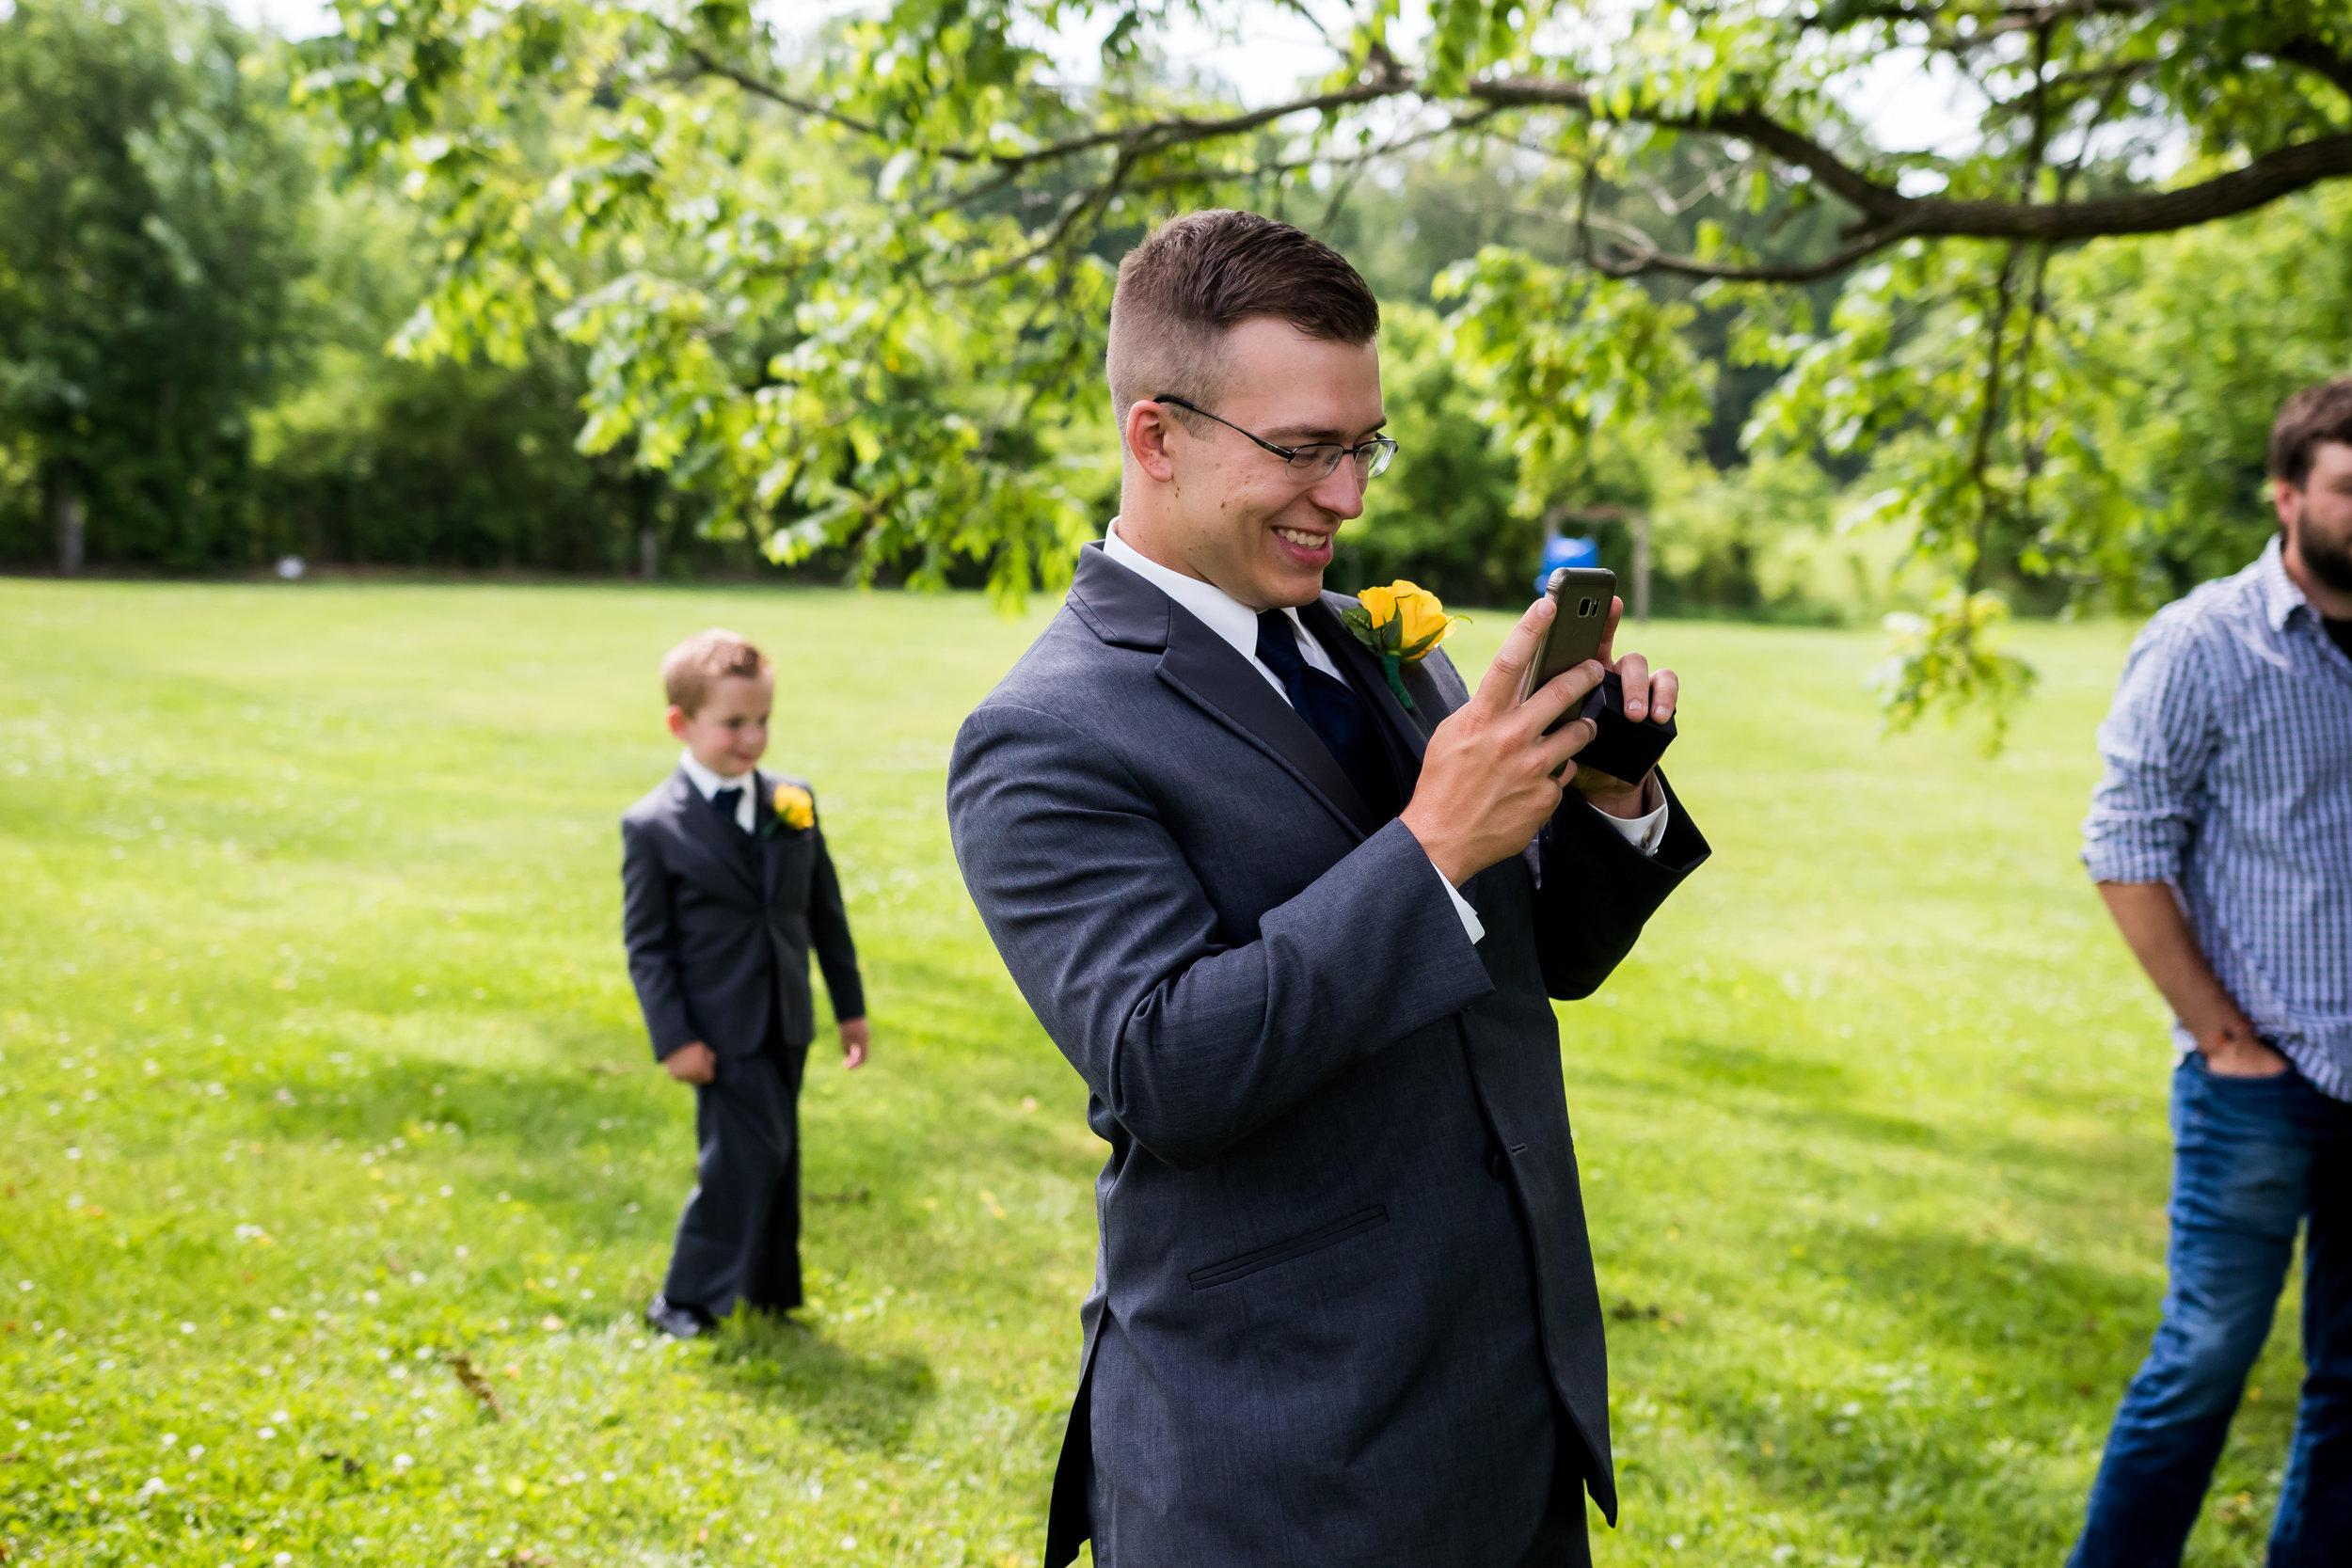 Wedding_Photography_Ward-181.jpg